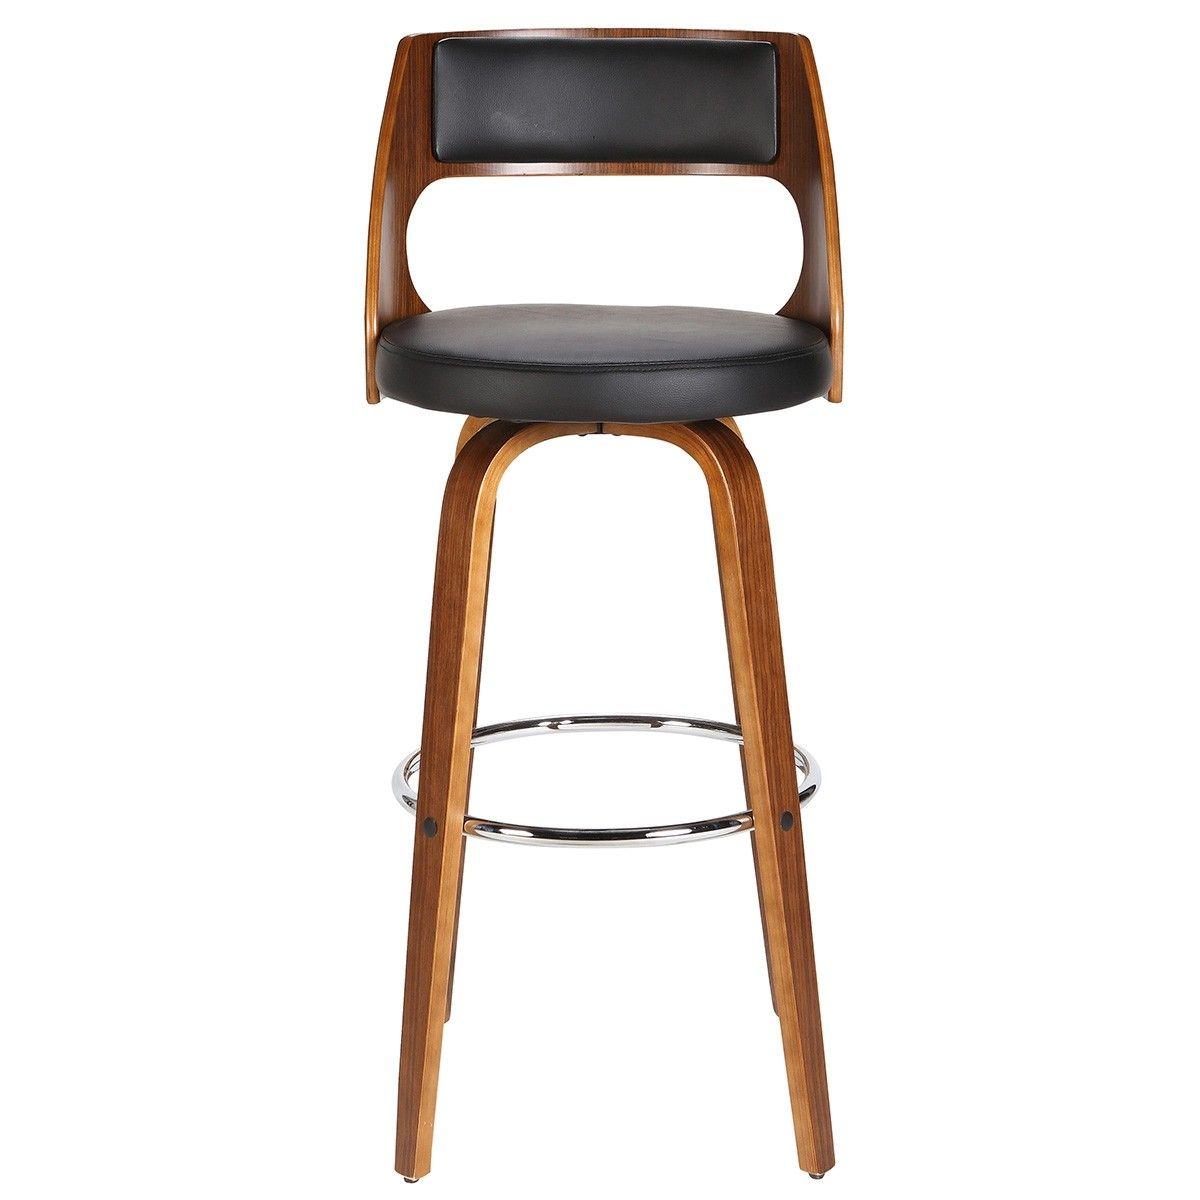 Fine Brakel Wooden Swivel Counter Stool With Pu Seat Black Uwap Interior Chair Design Uwaporg